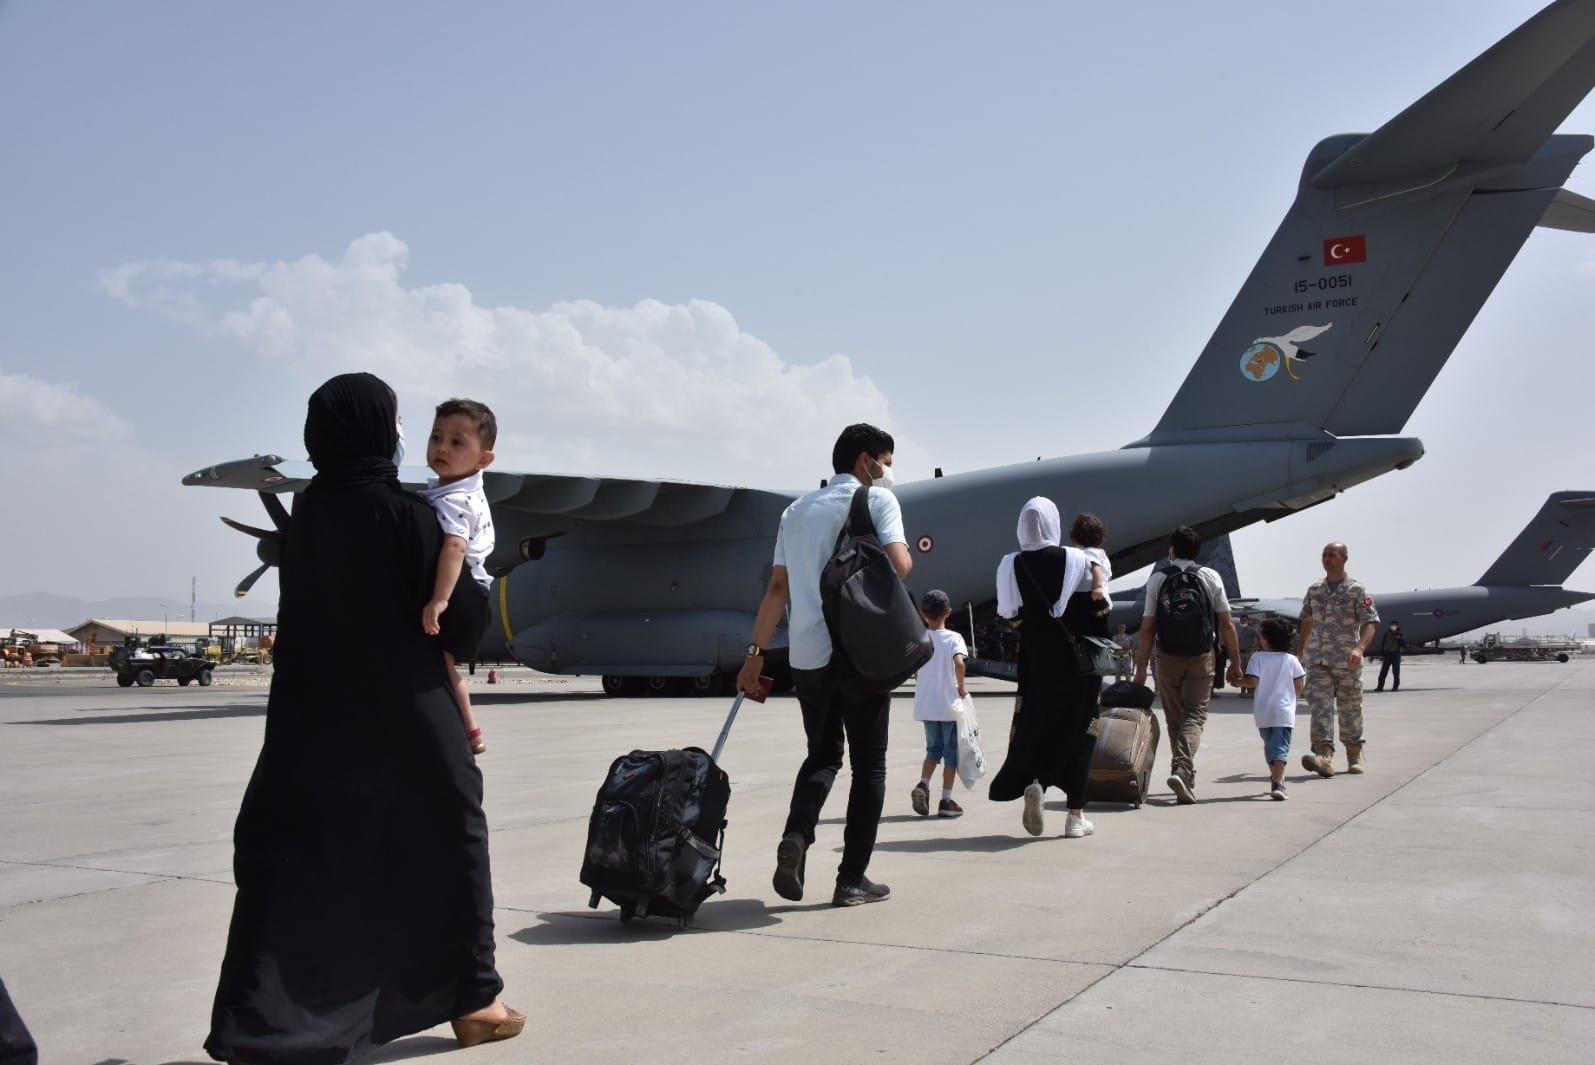 Turkey evacuates at least 200 citizens from Kabul Hamid Karzai International Airport, Kabul, Afghanistan, Aug. 18, 2021. (IHA Photo)